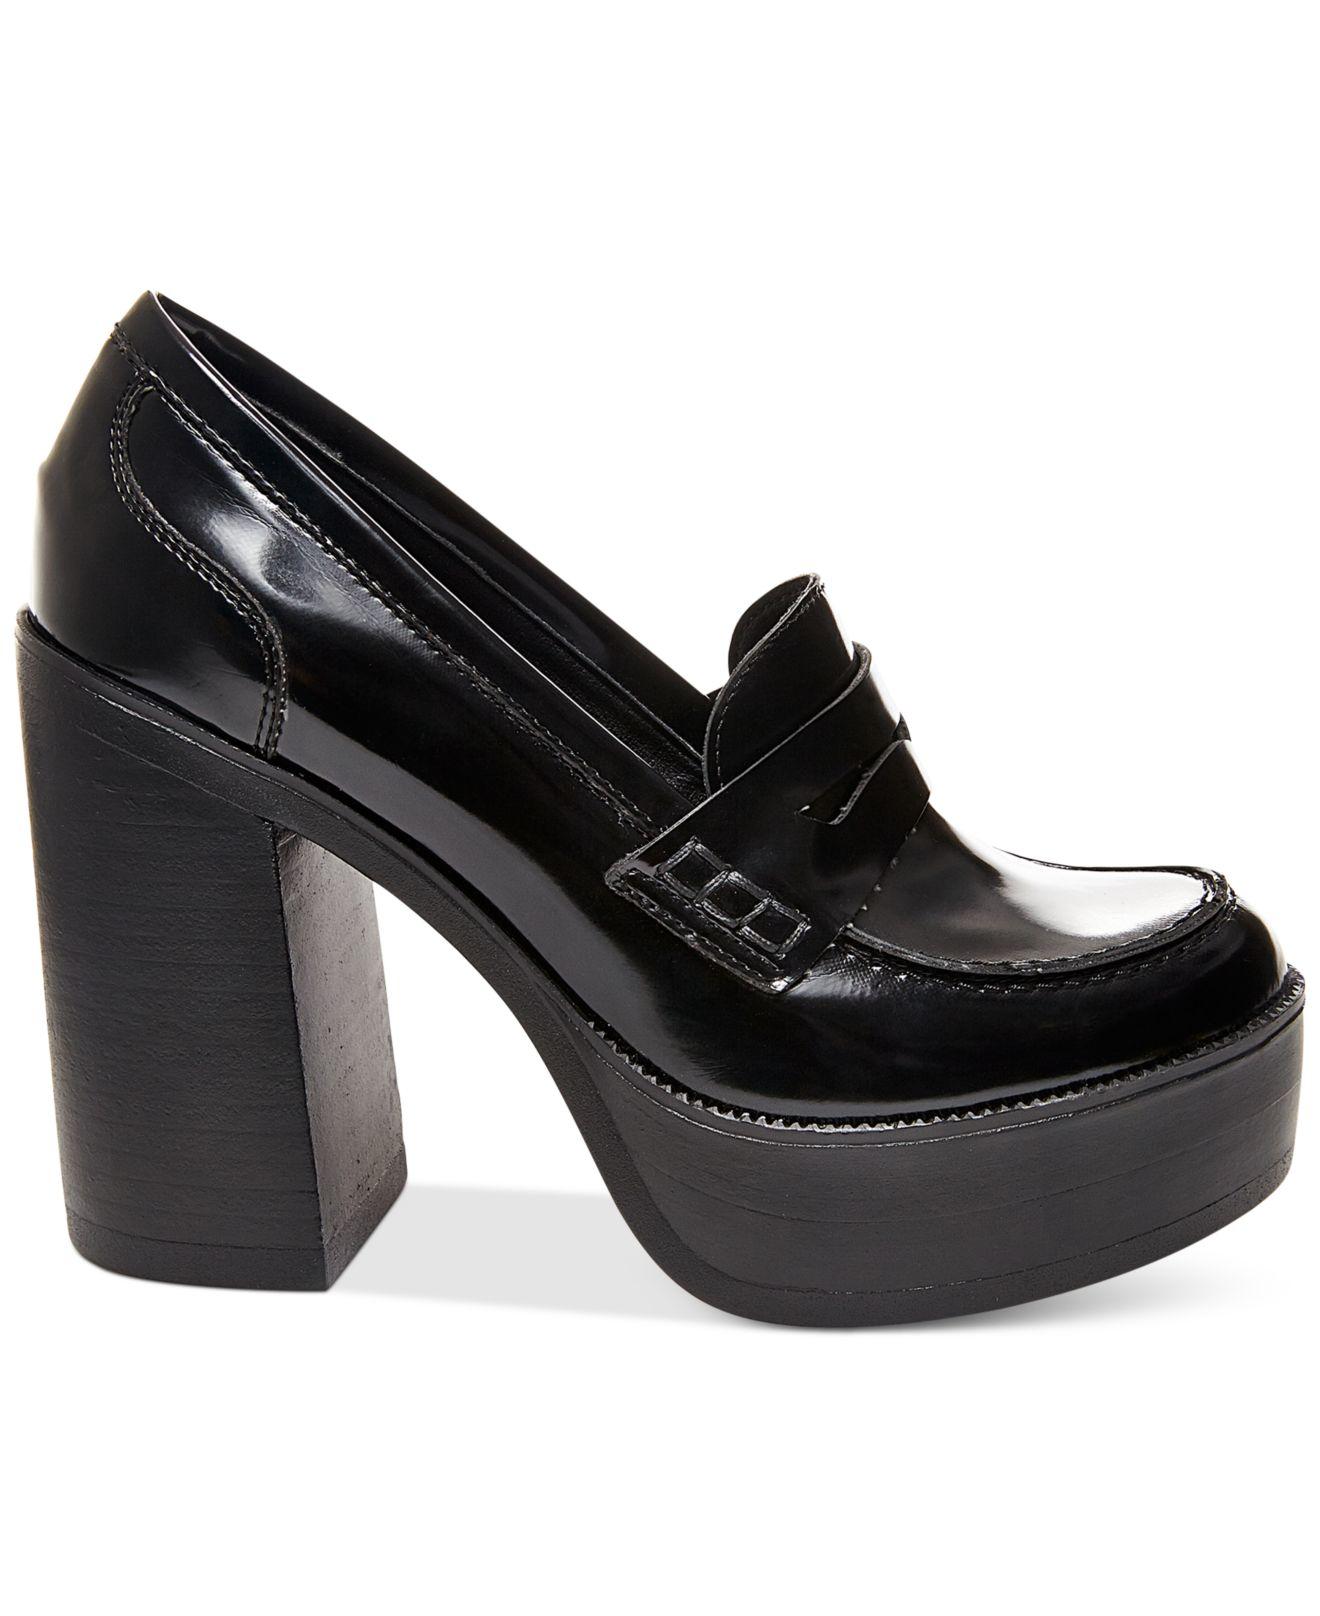 Steve madden Women's Juniper Platform Penny Loafers in ...